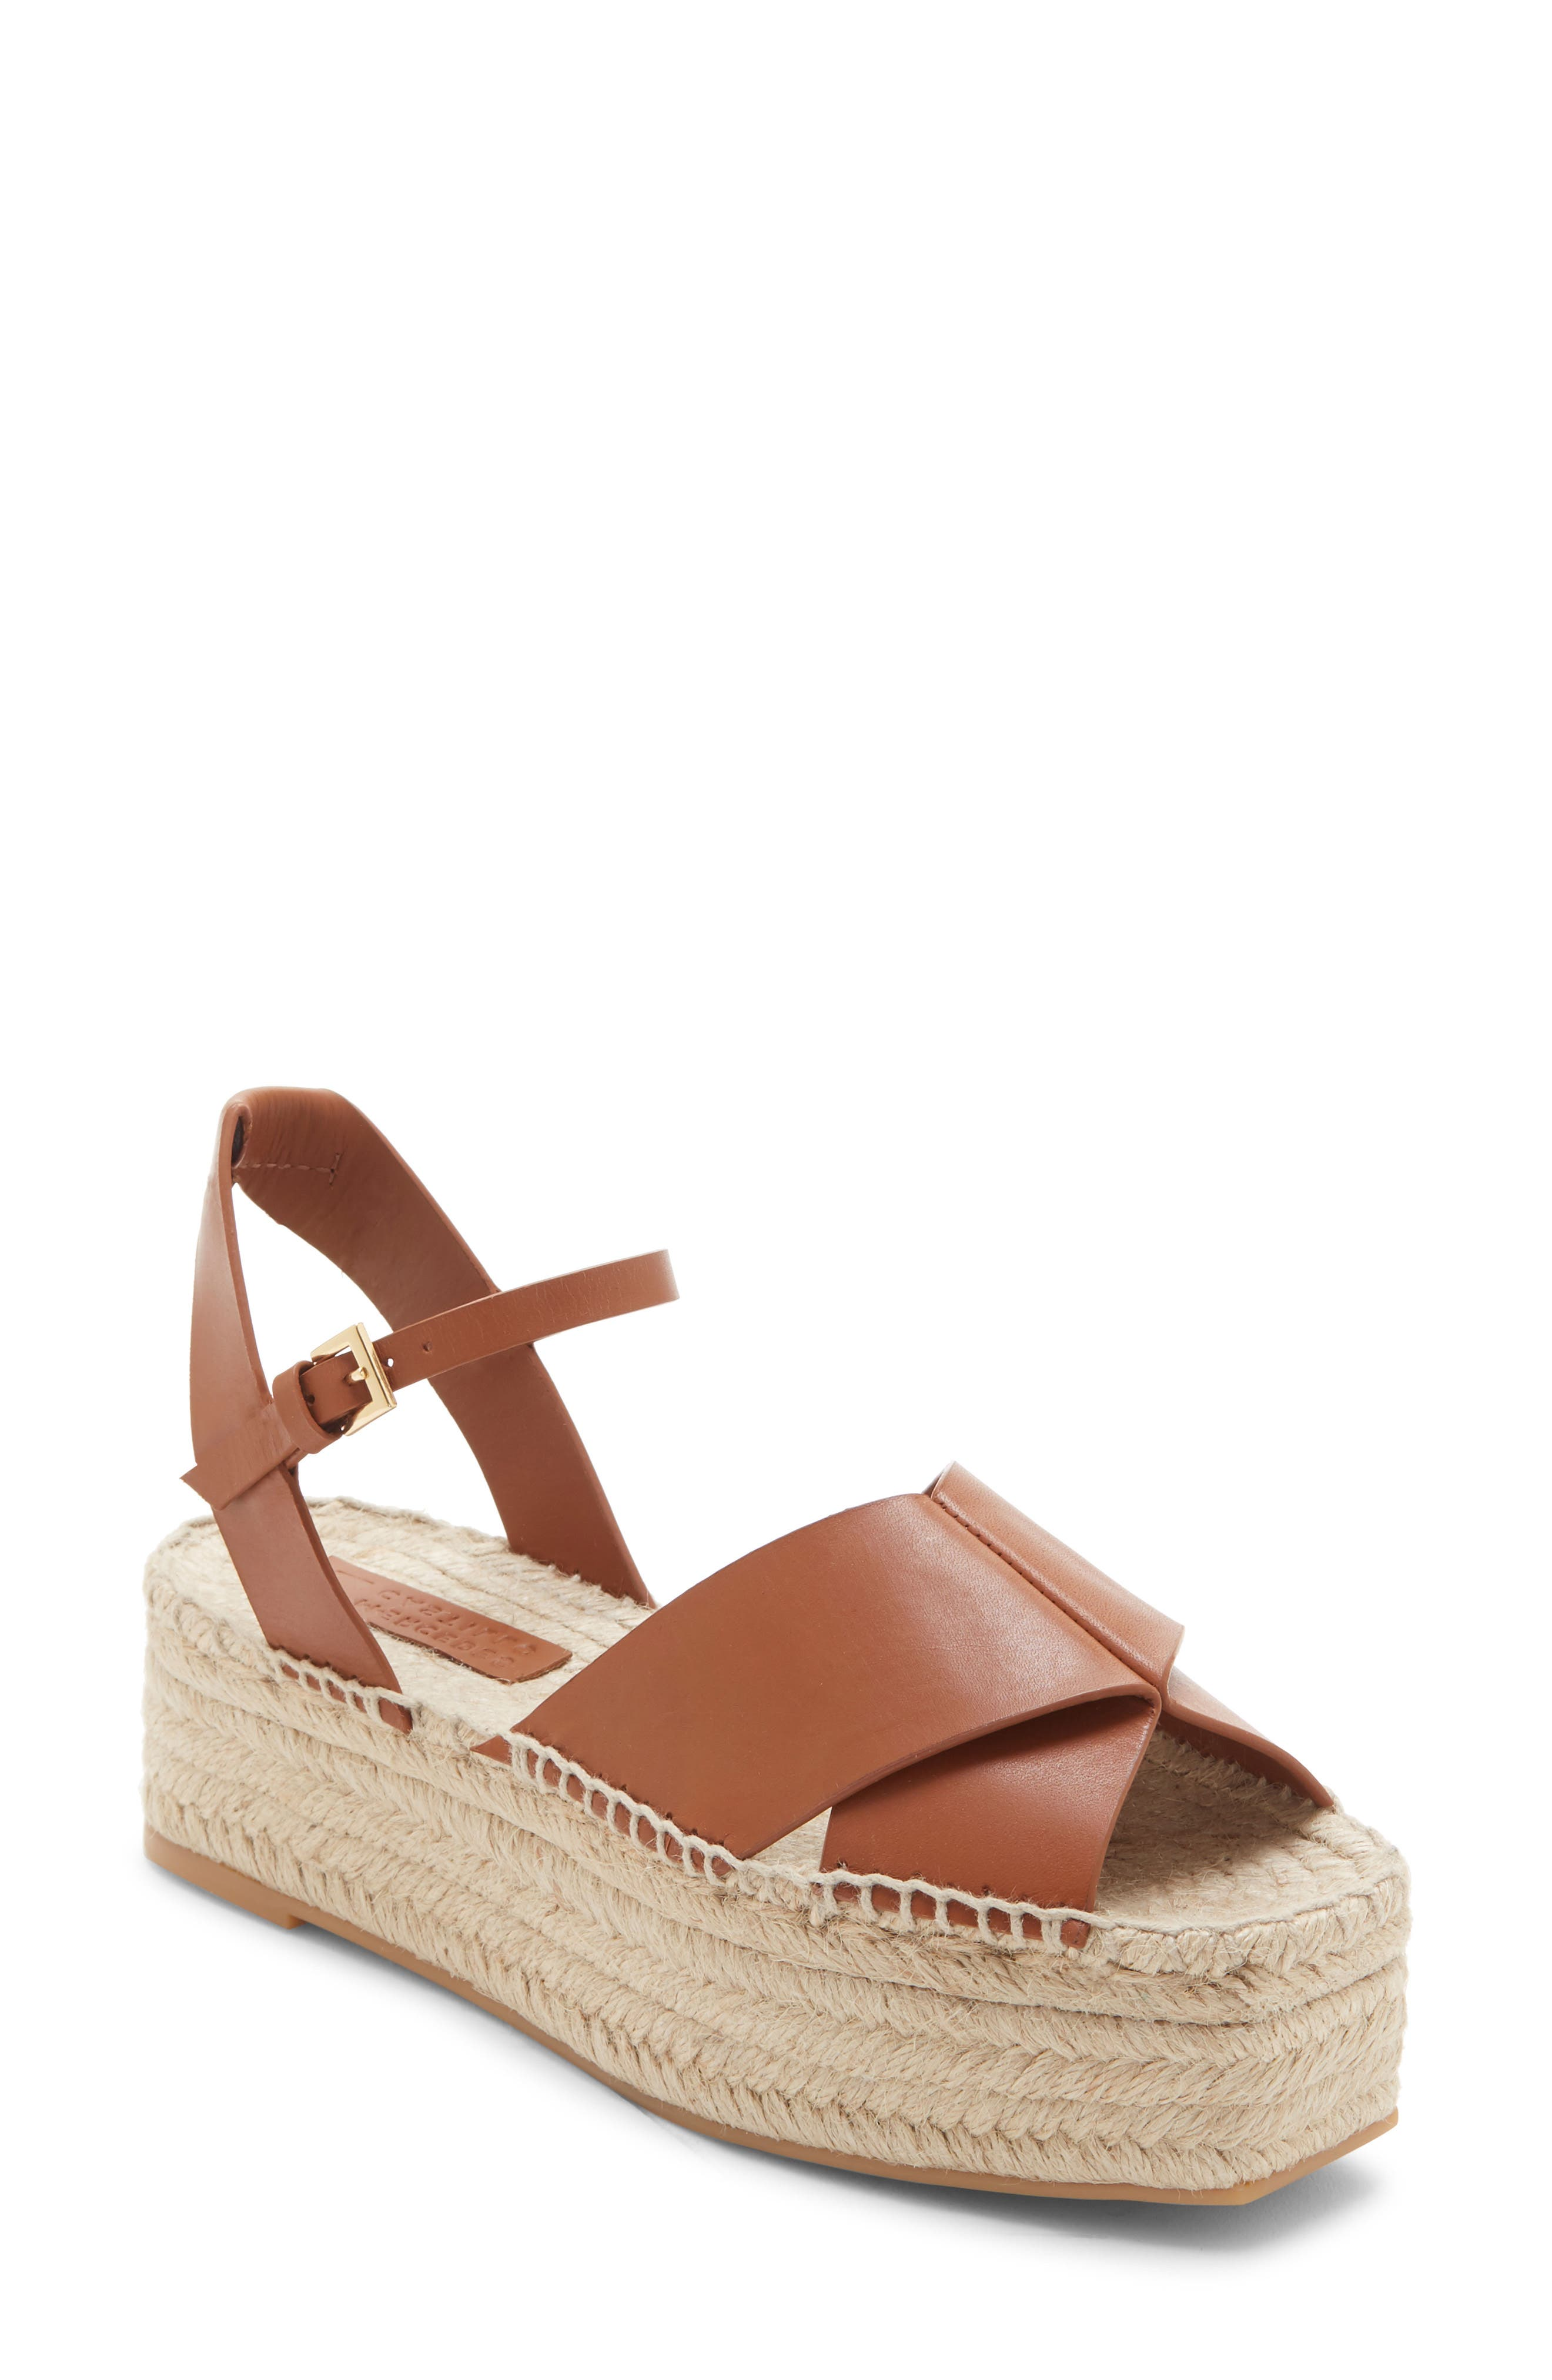 Mercedes Castillo Ximena Espadrille Platform Sandal, Brown